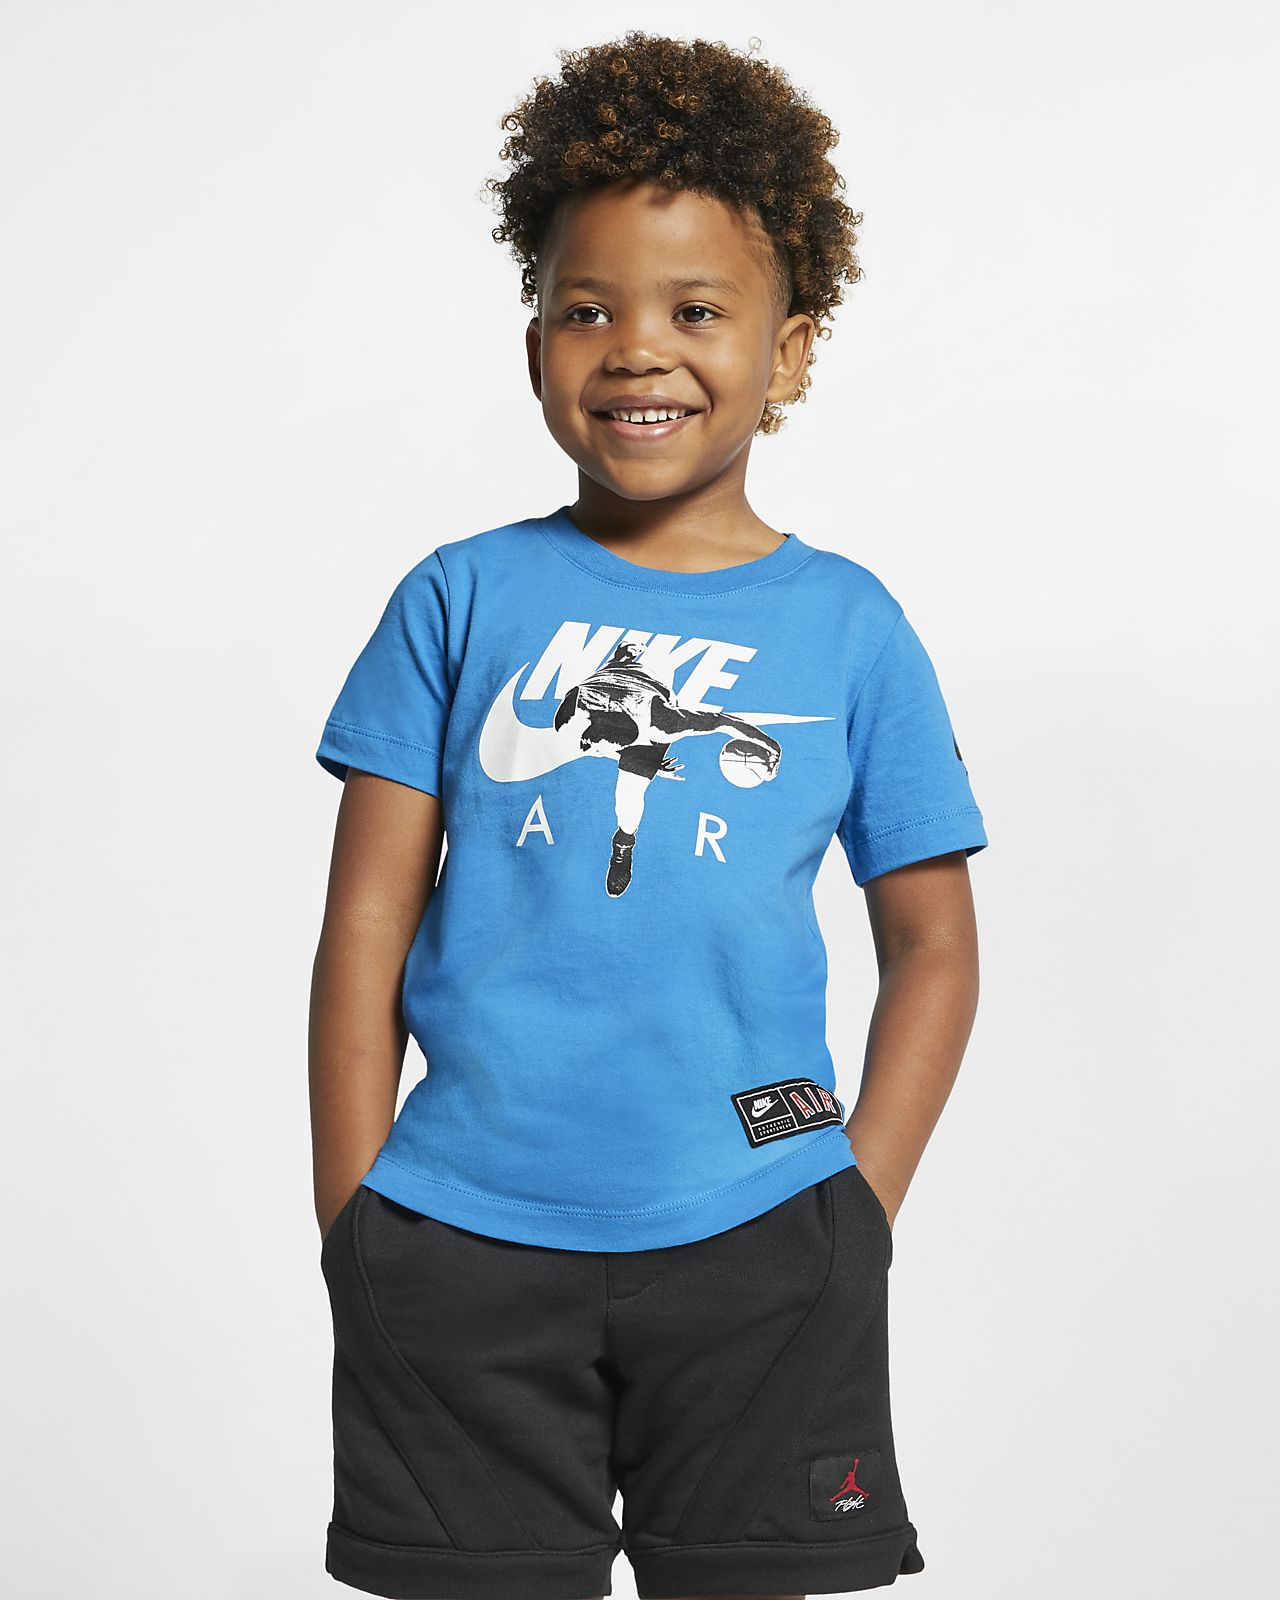 721fb865cef5 Nike Air Little Kids' T-Shirt. Nike.com